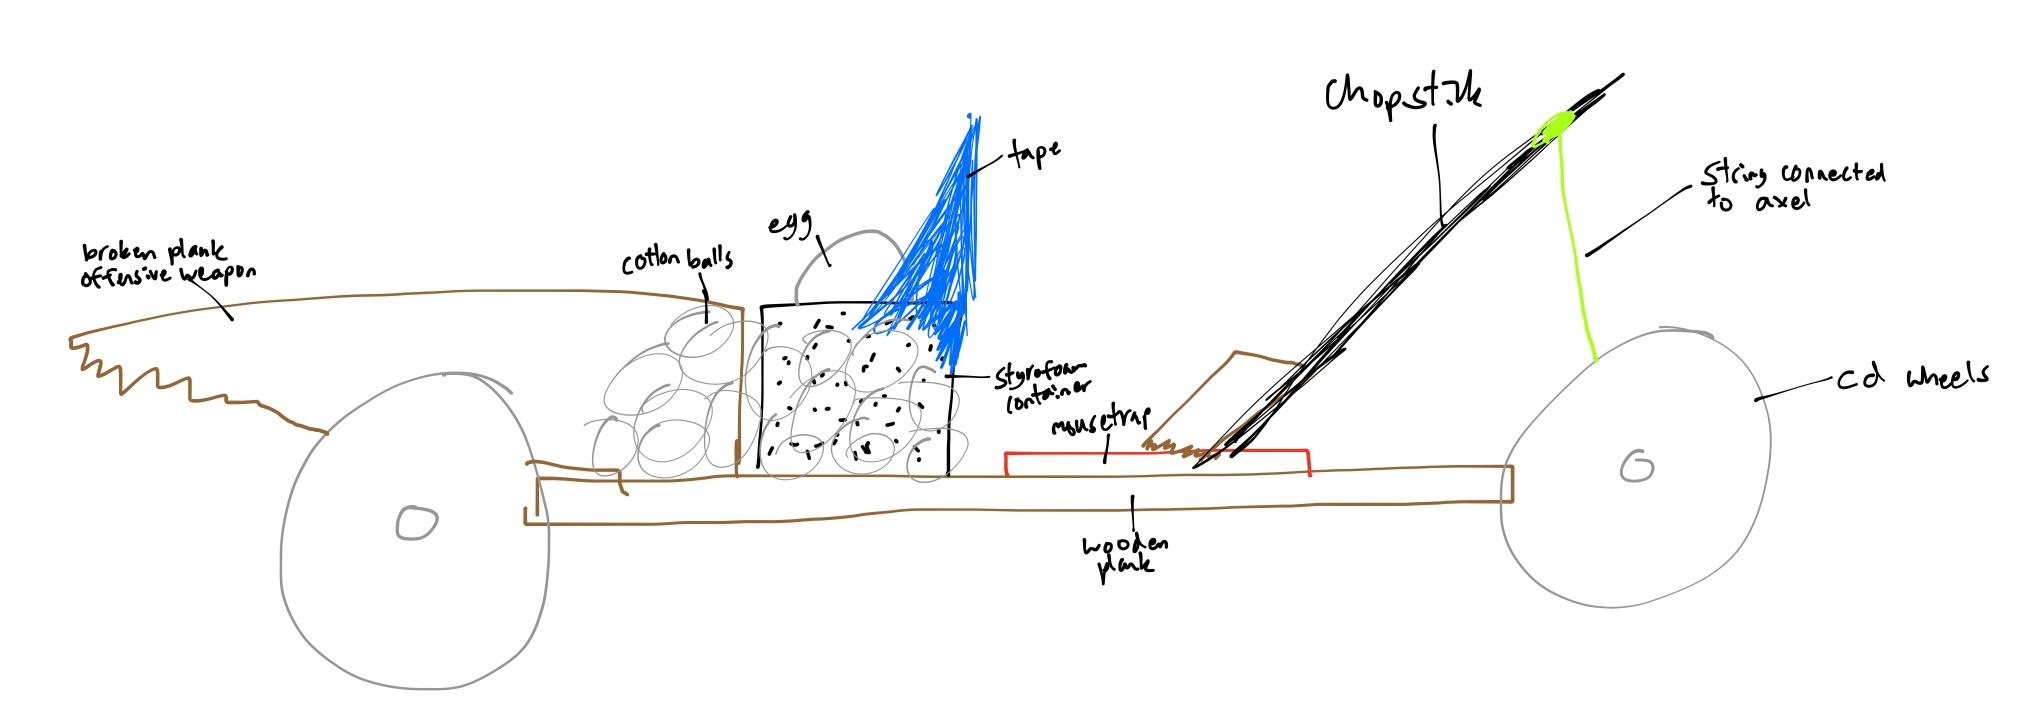 joust wiring diagram